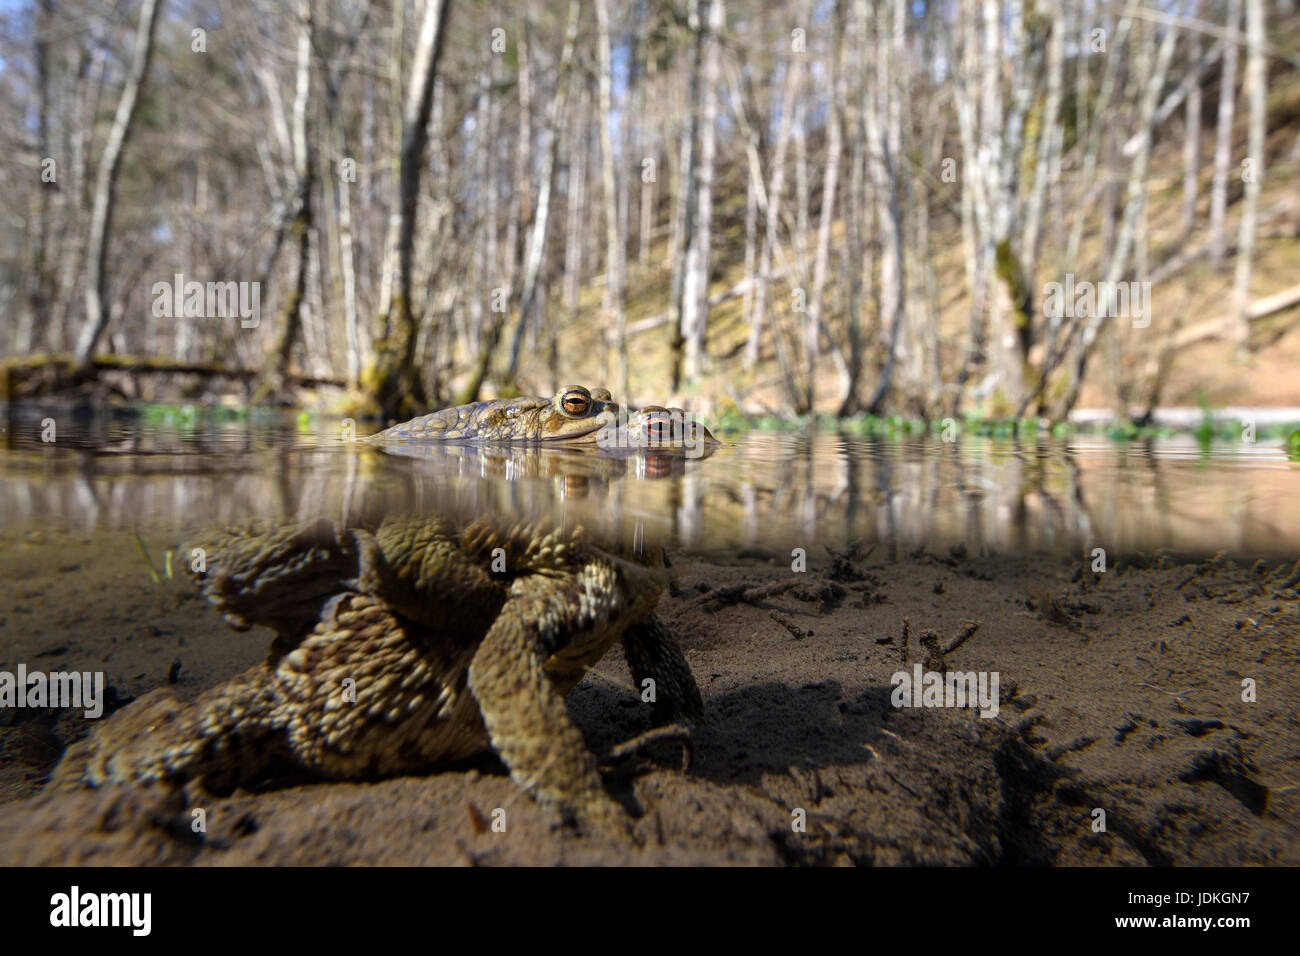 Earth toads pair in the spawn pool, Bufo bufo, Erdkröten Paar im Laichtümpel Stock Photo